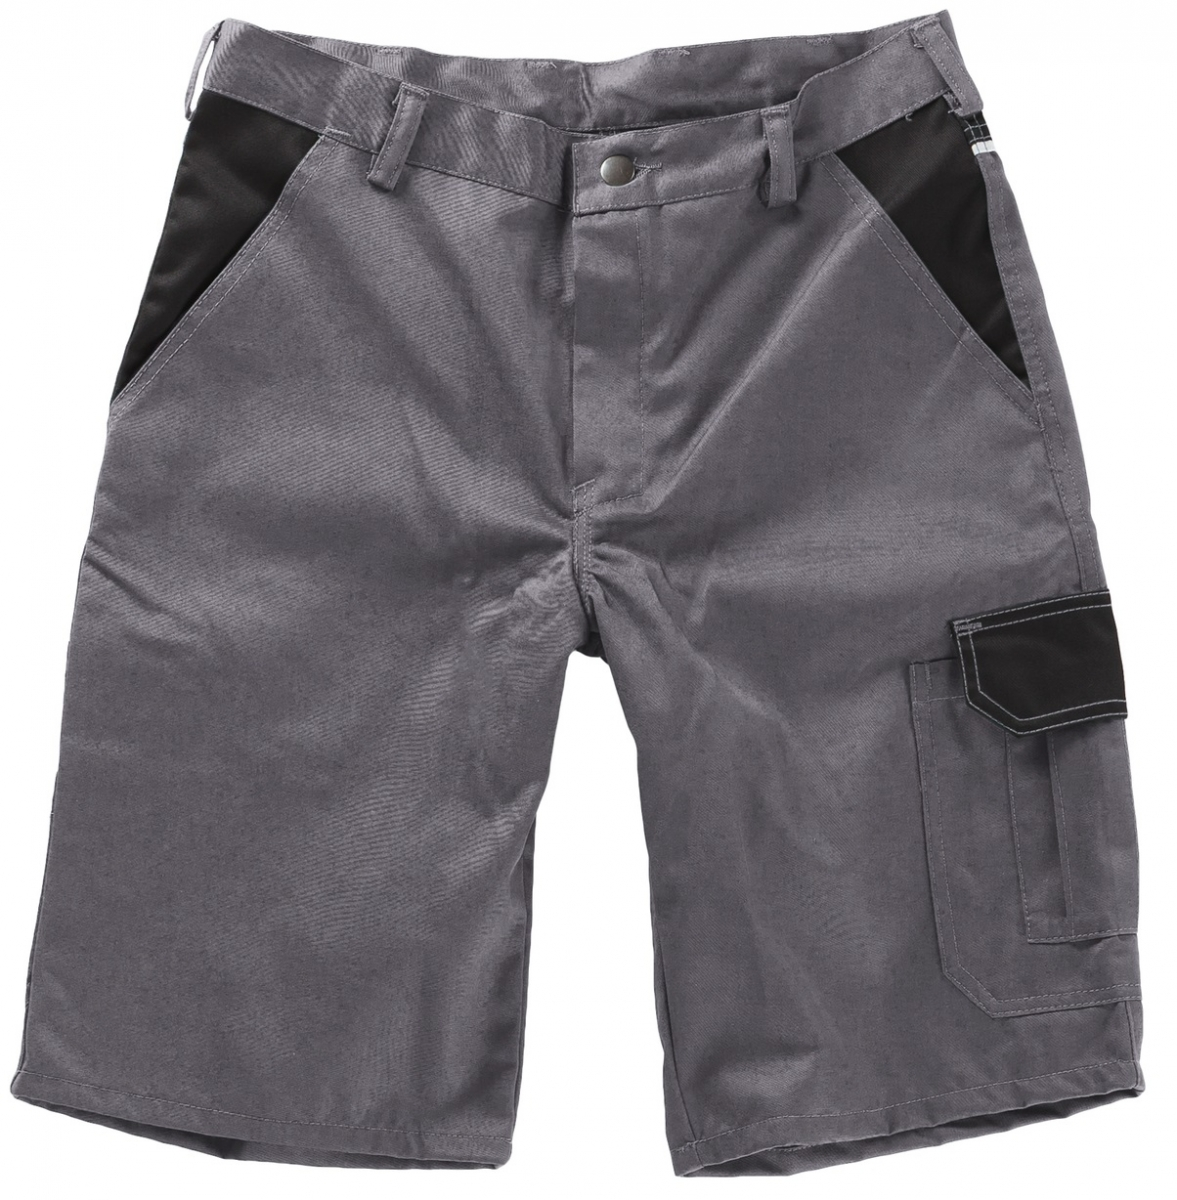 BEB-Arbeits-Berufs-Shorts, 245 g/m², grau/schwarz